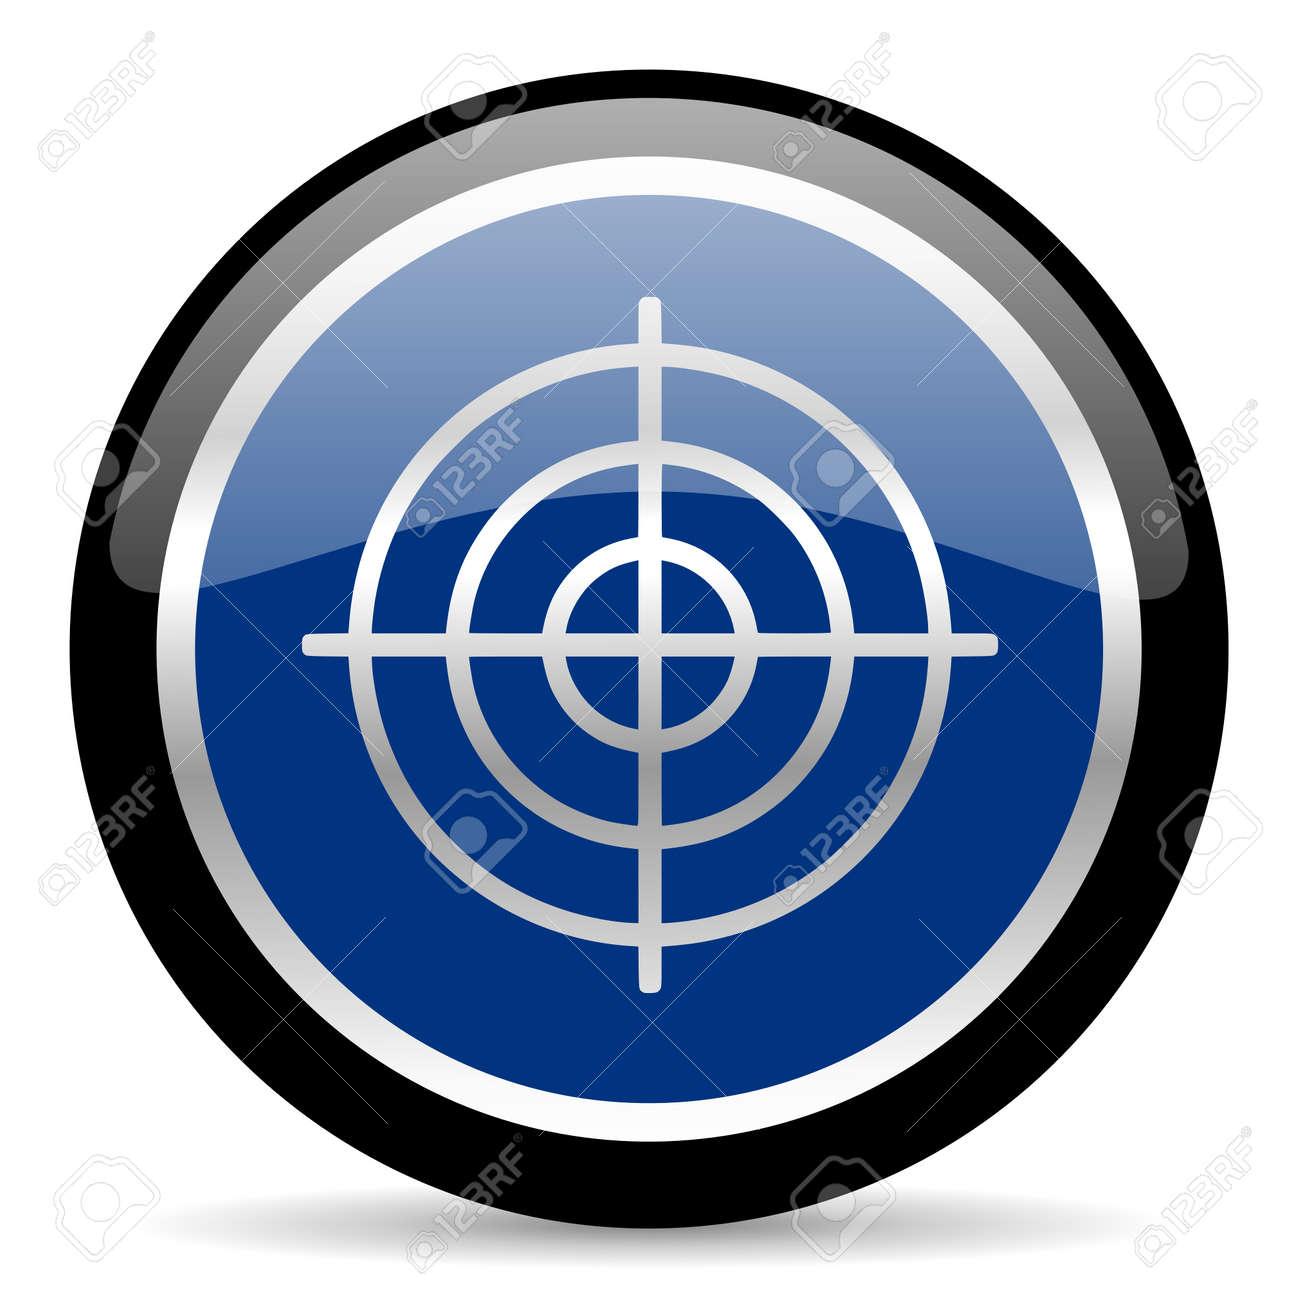 blue web button Stock Photo - 26087883